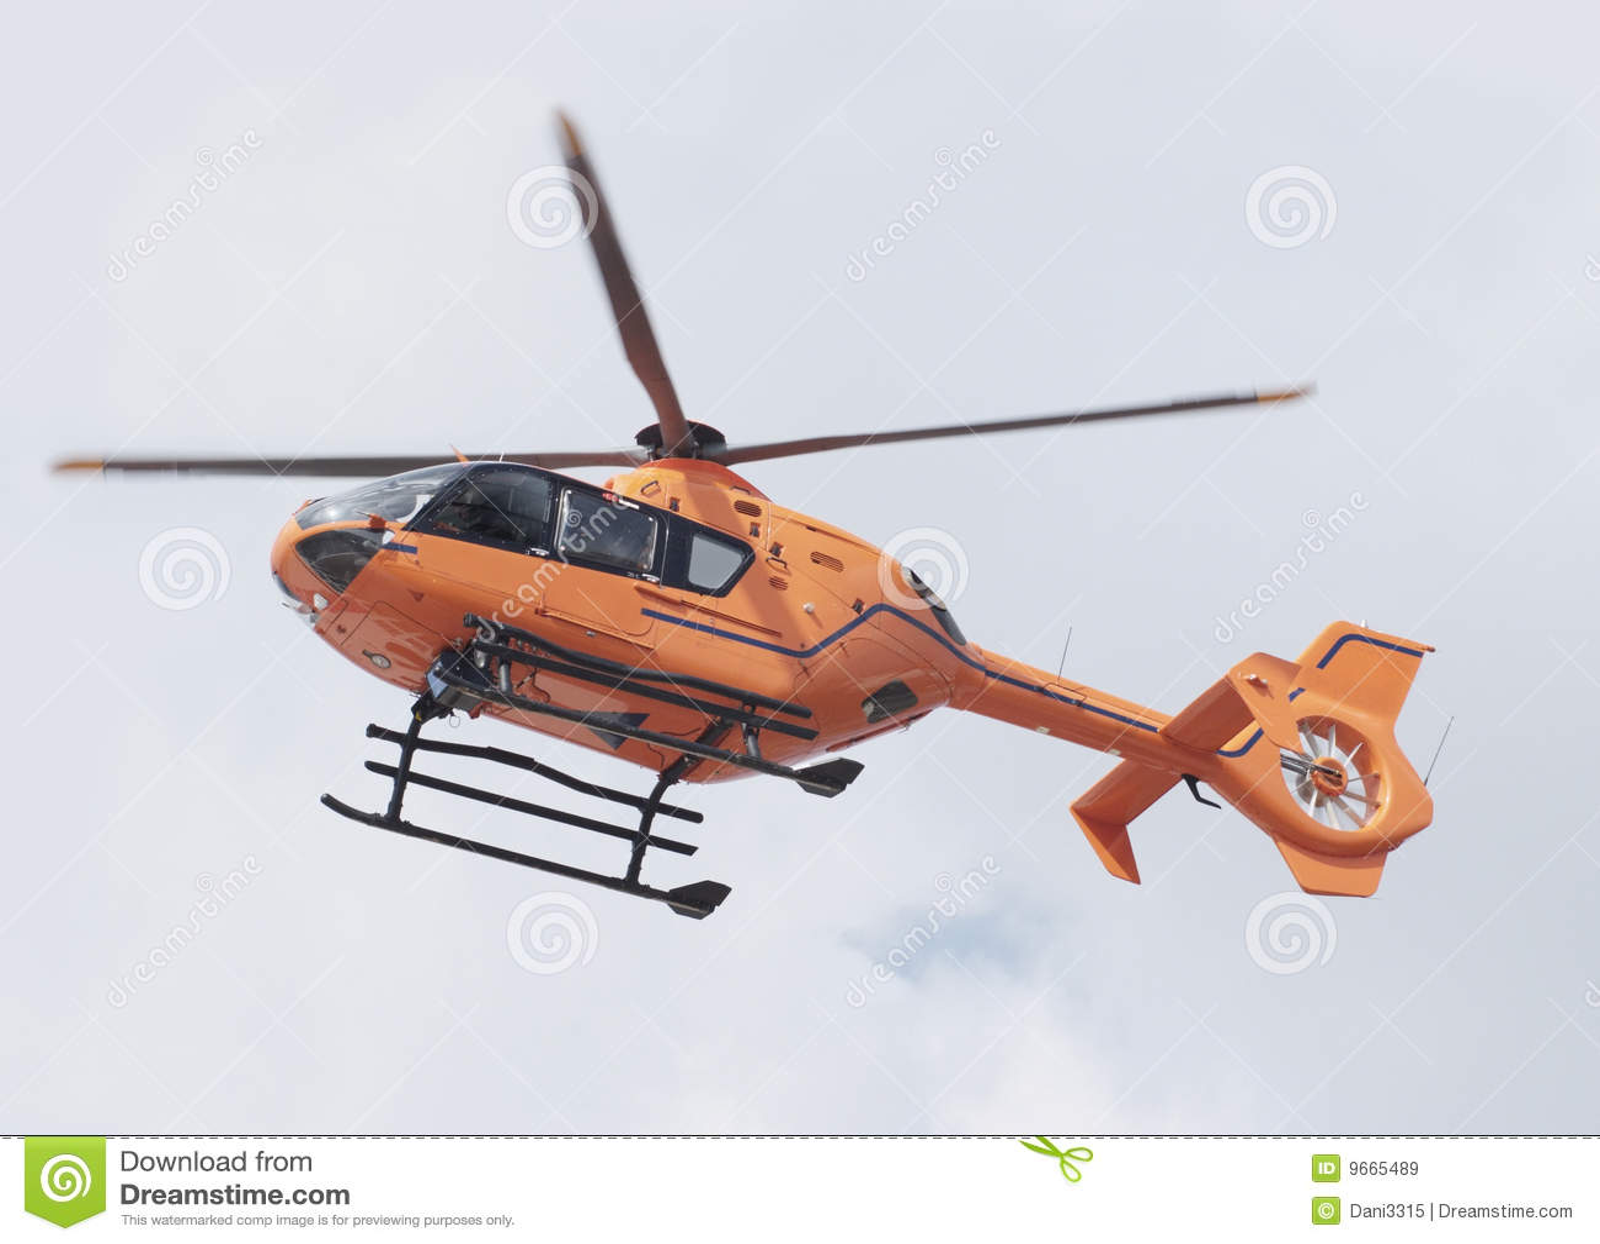 Helicopter orange rescue